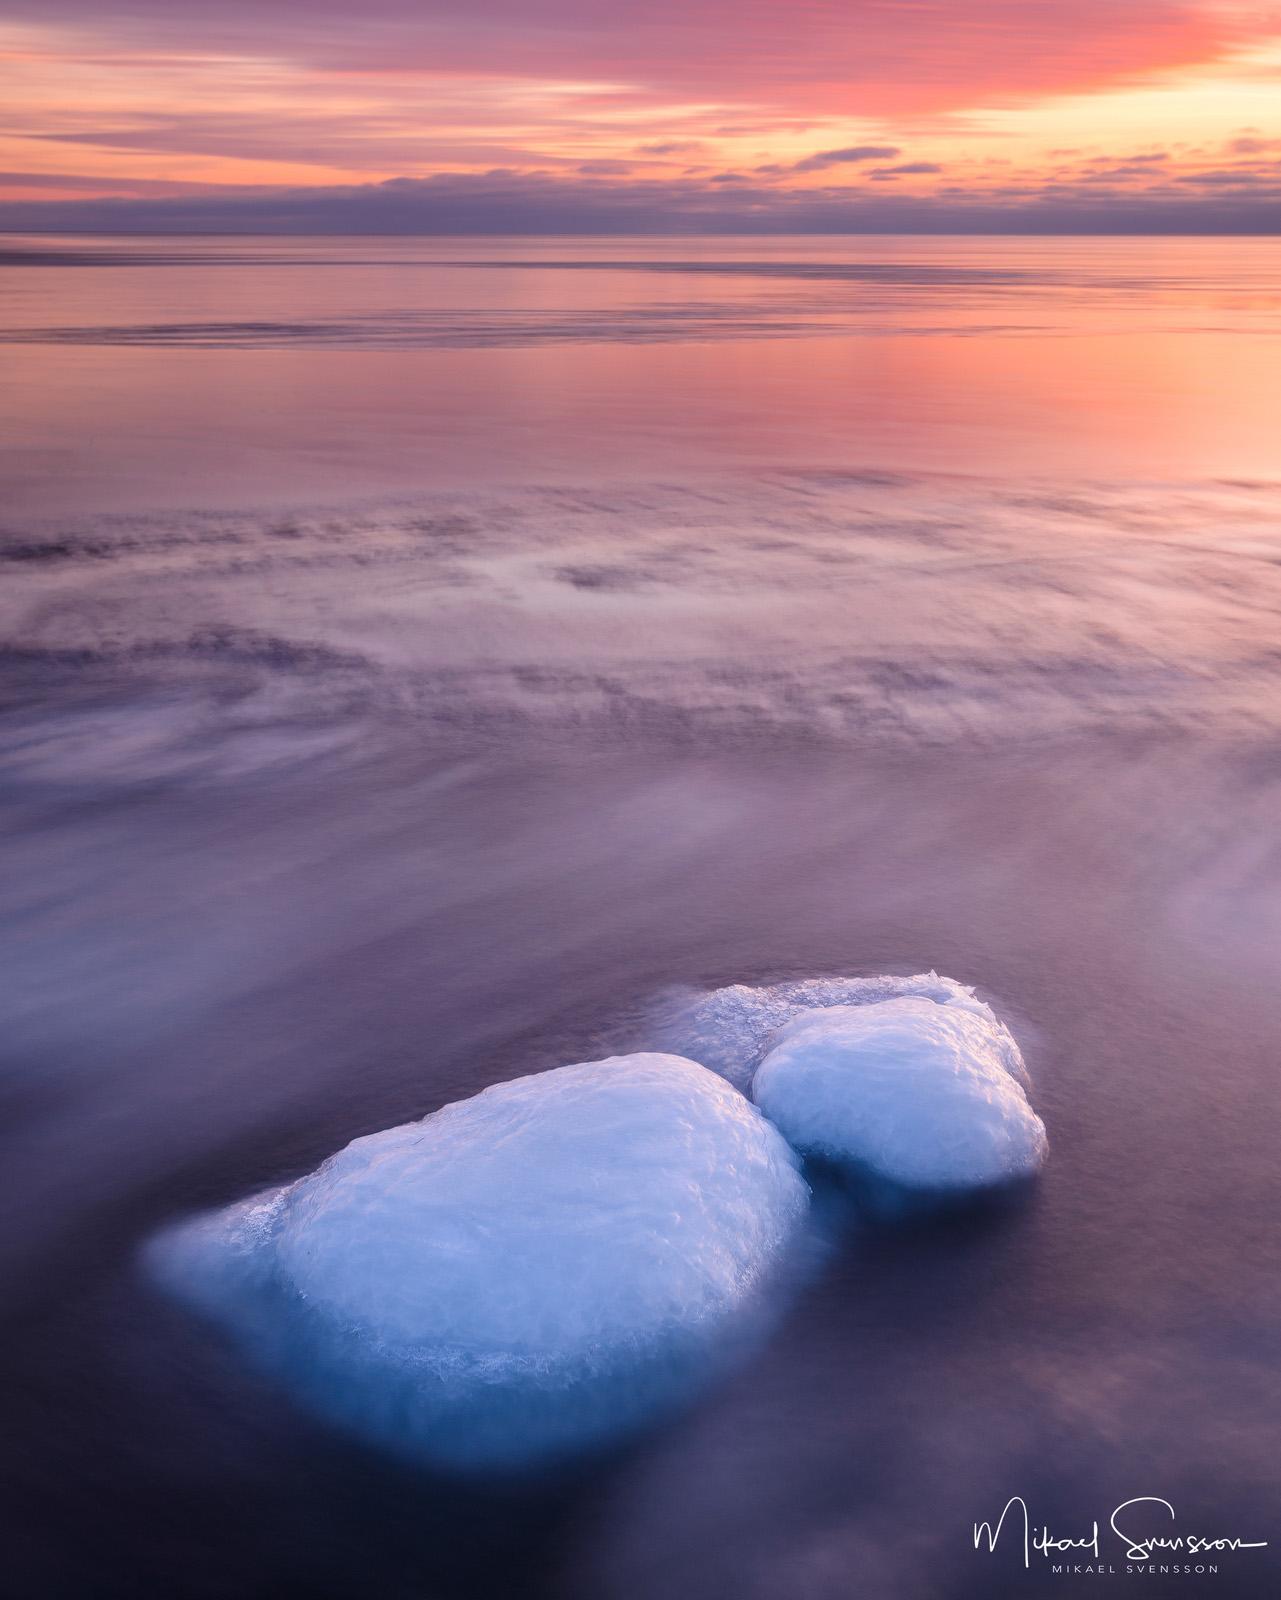 Näsbokrok Naturreservat, Halland